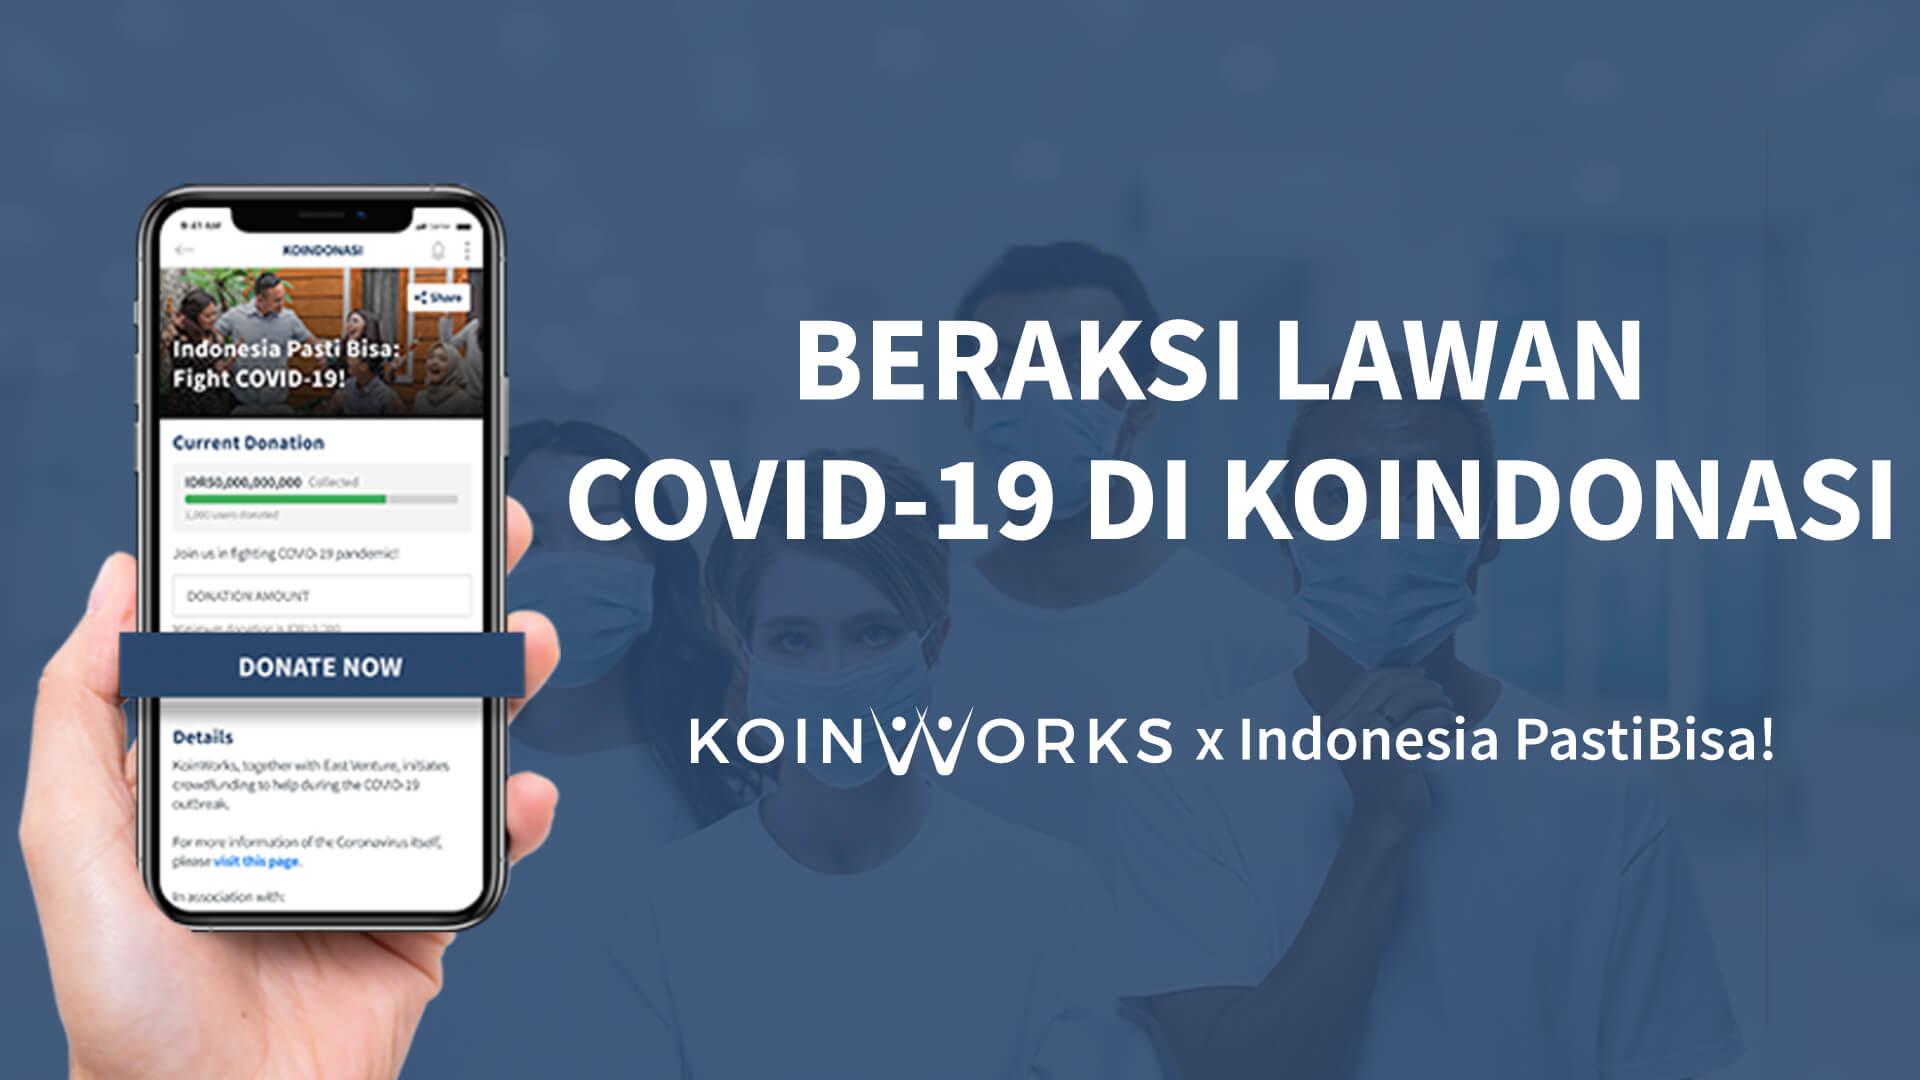 koindonasi COVID-19 corona asuransi kesehatan